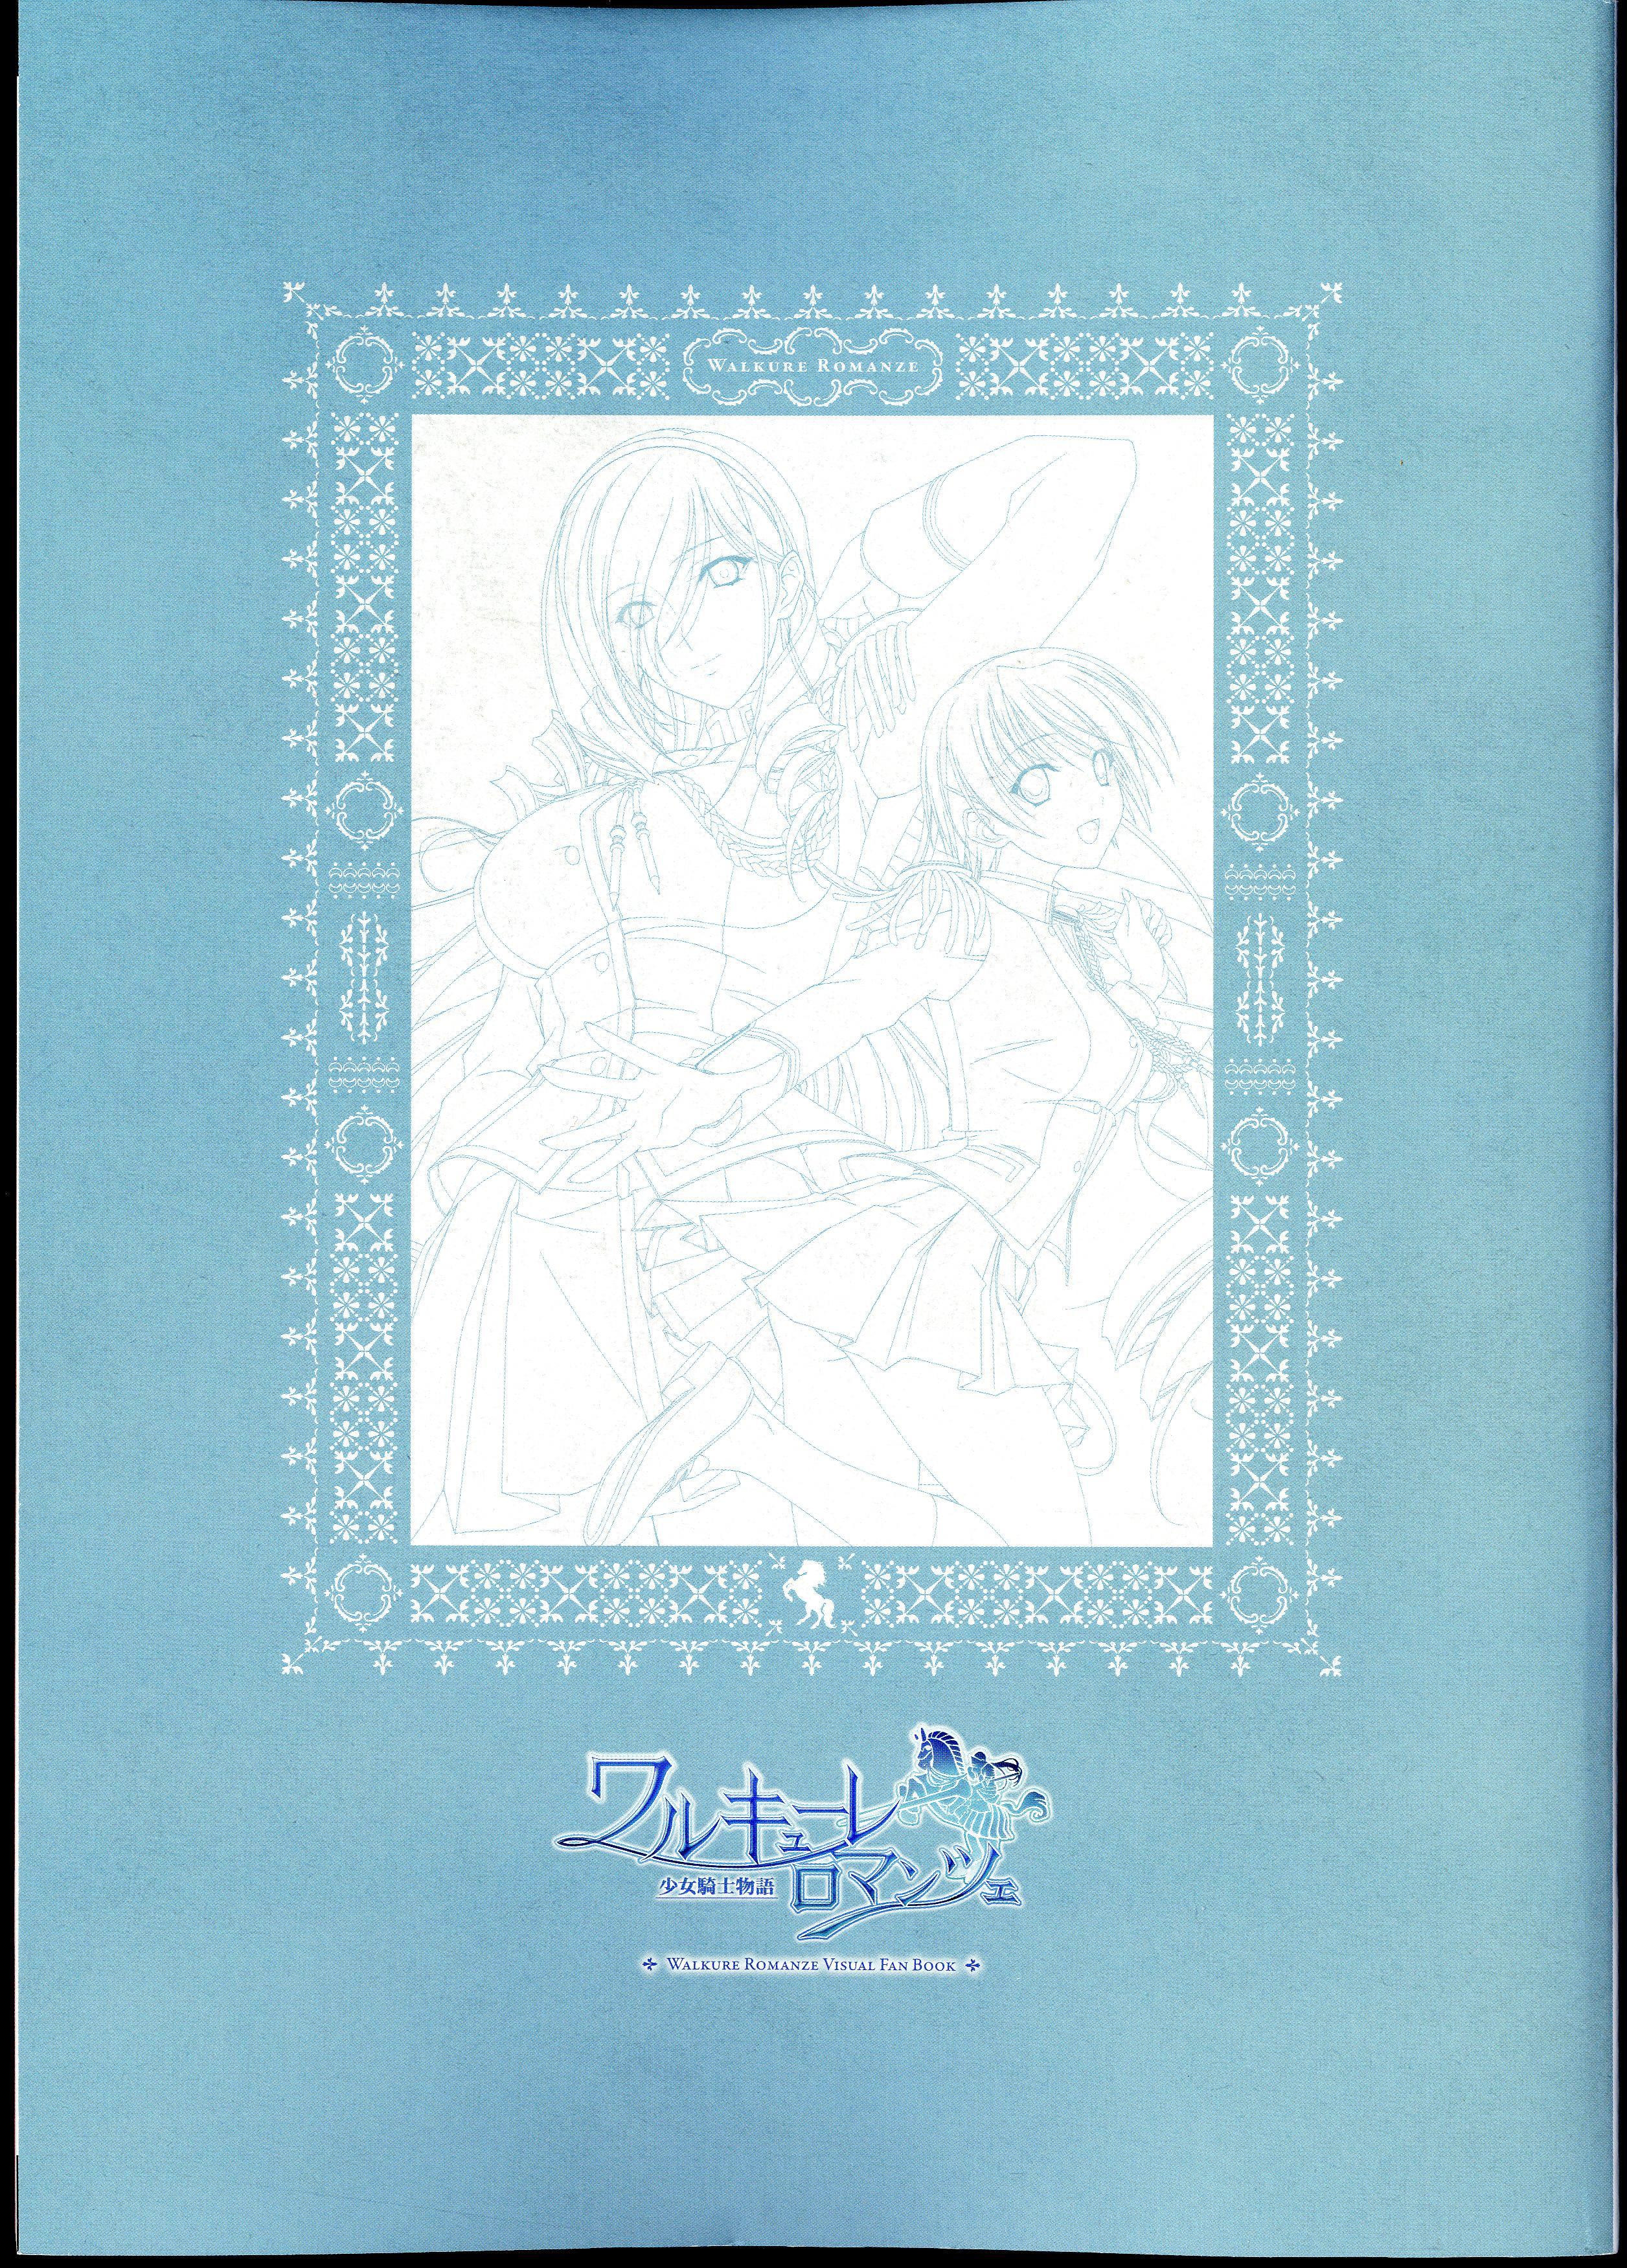 Walkure Romanze Visual Fanbook 6